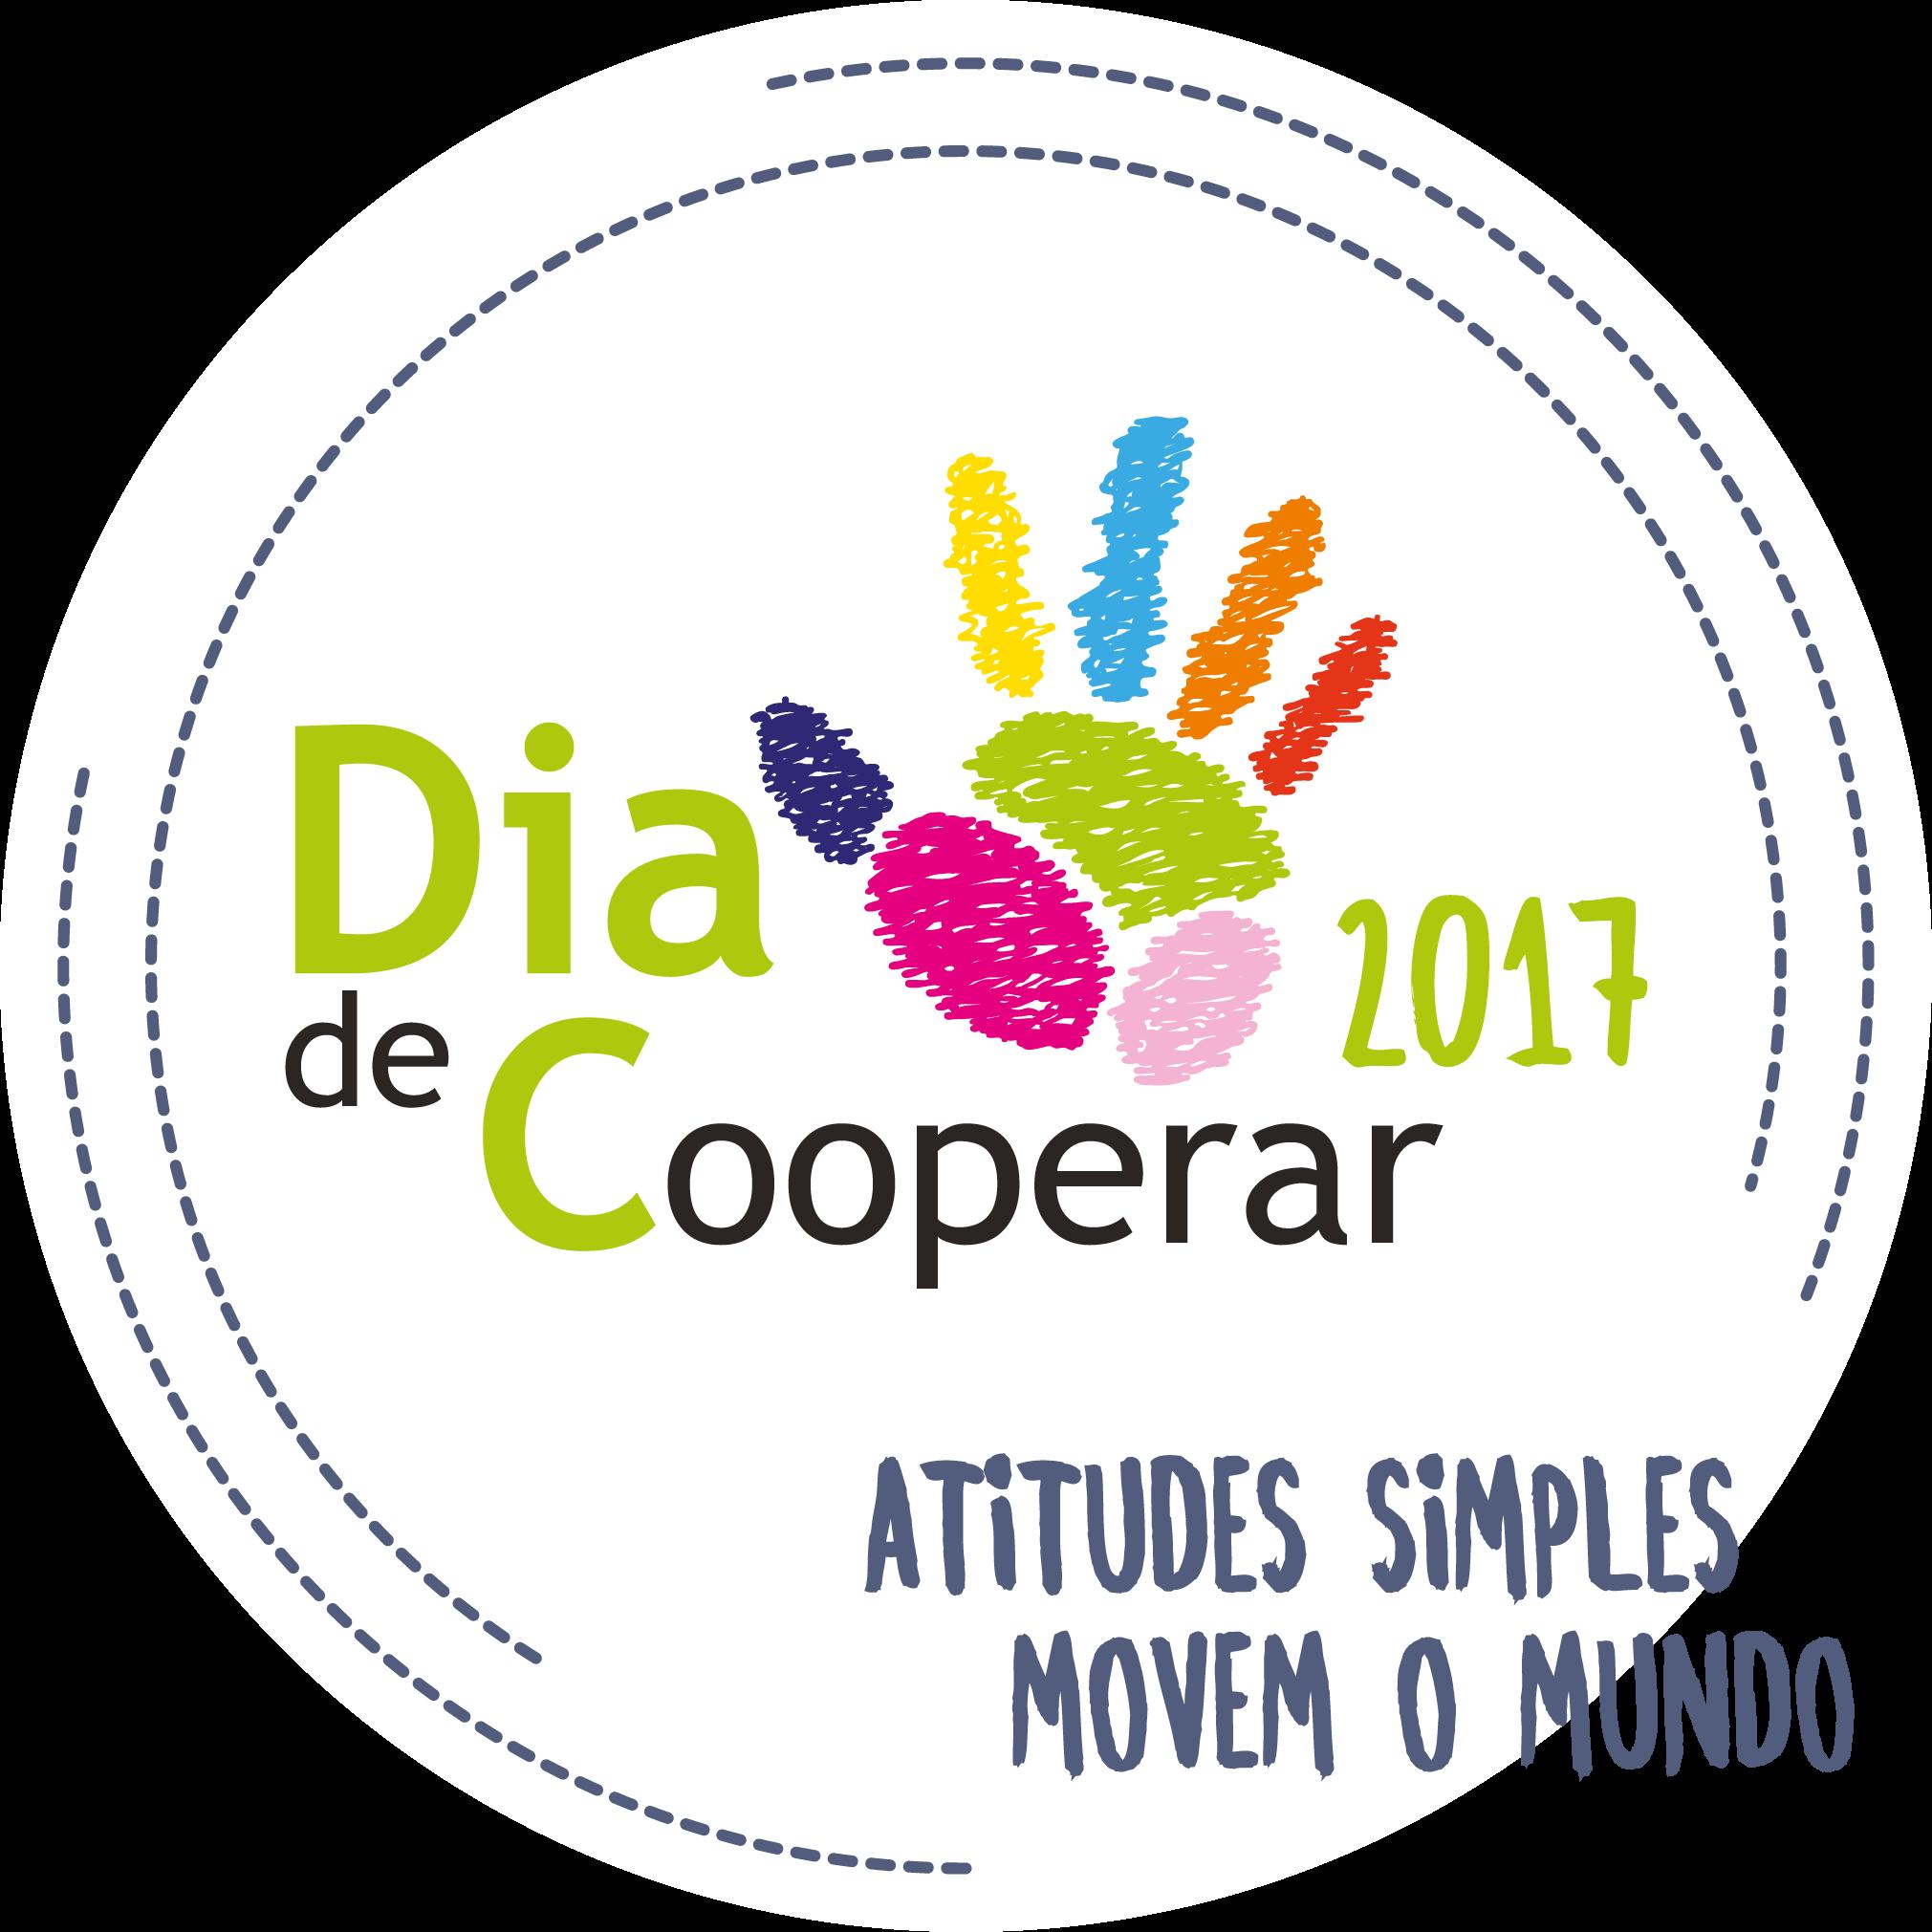 Dia de Cooperar 2017